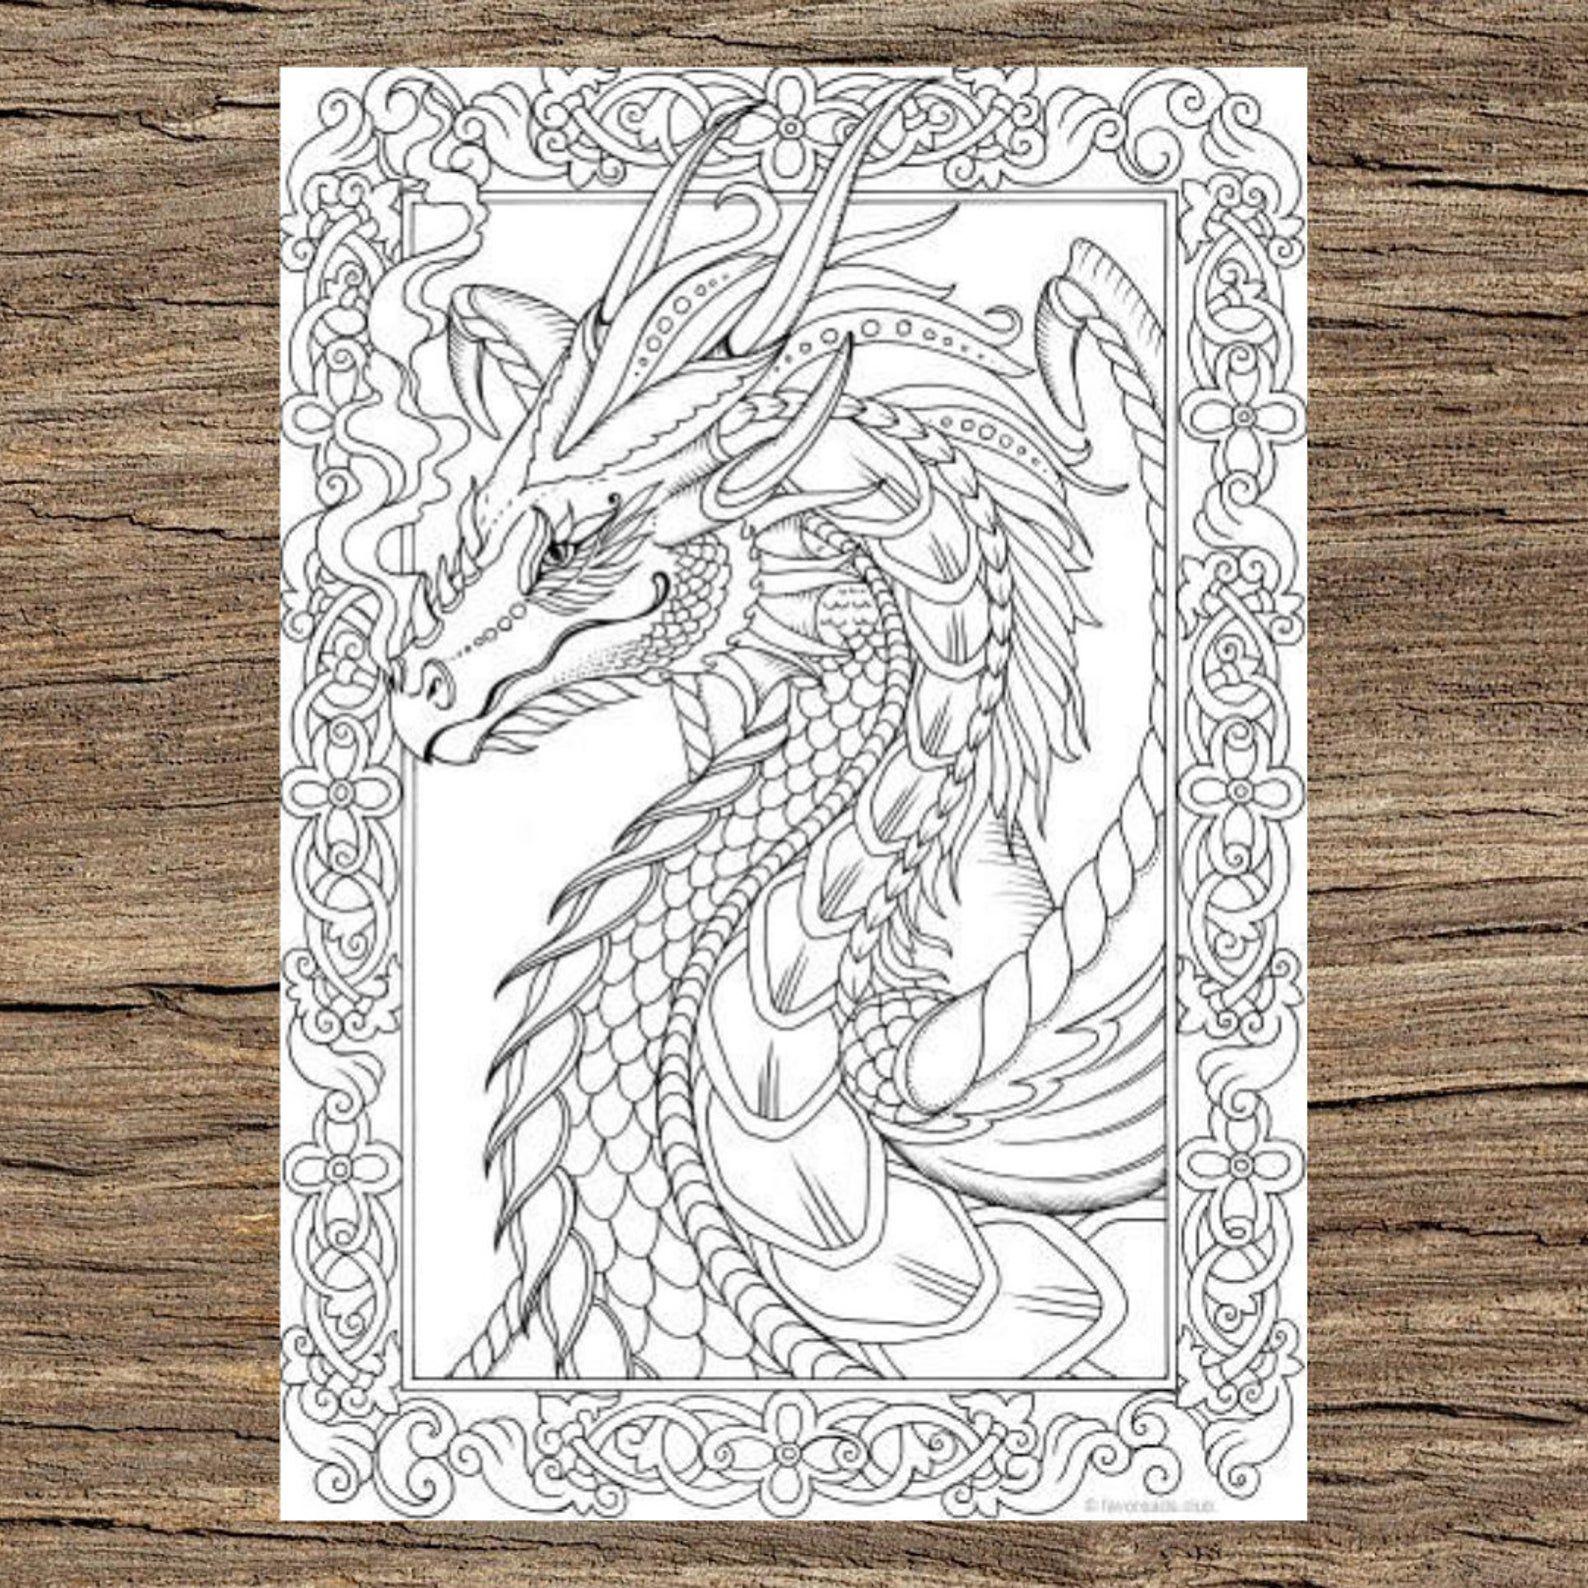 dargon coloring book design